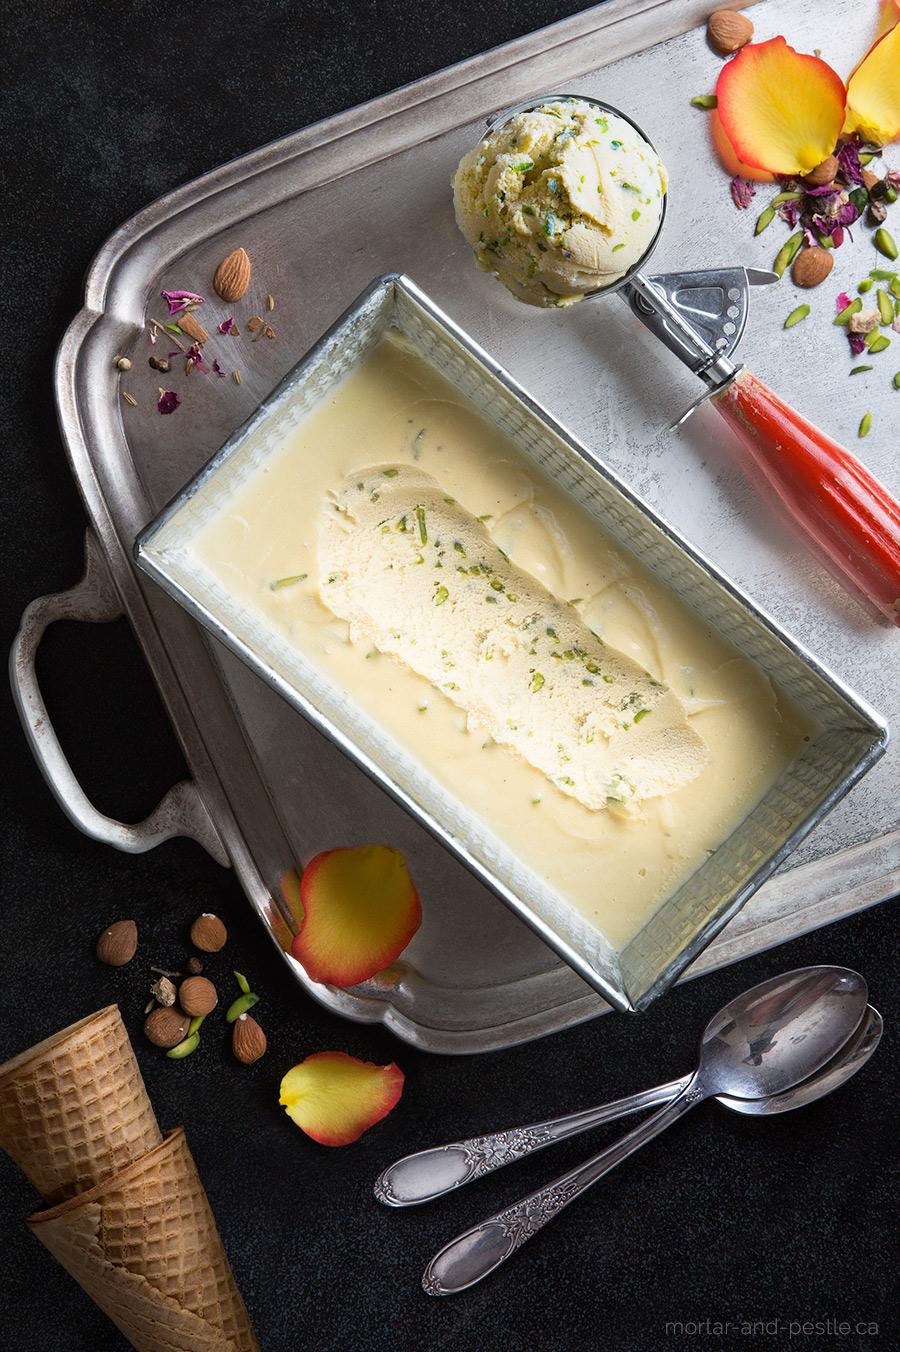 pistachio and apricot ice cream : mortar-and-pestle.ca